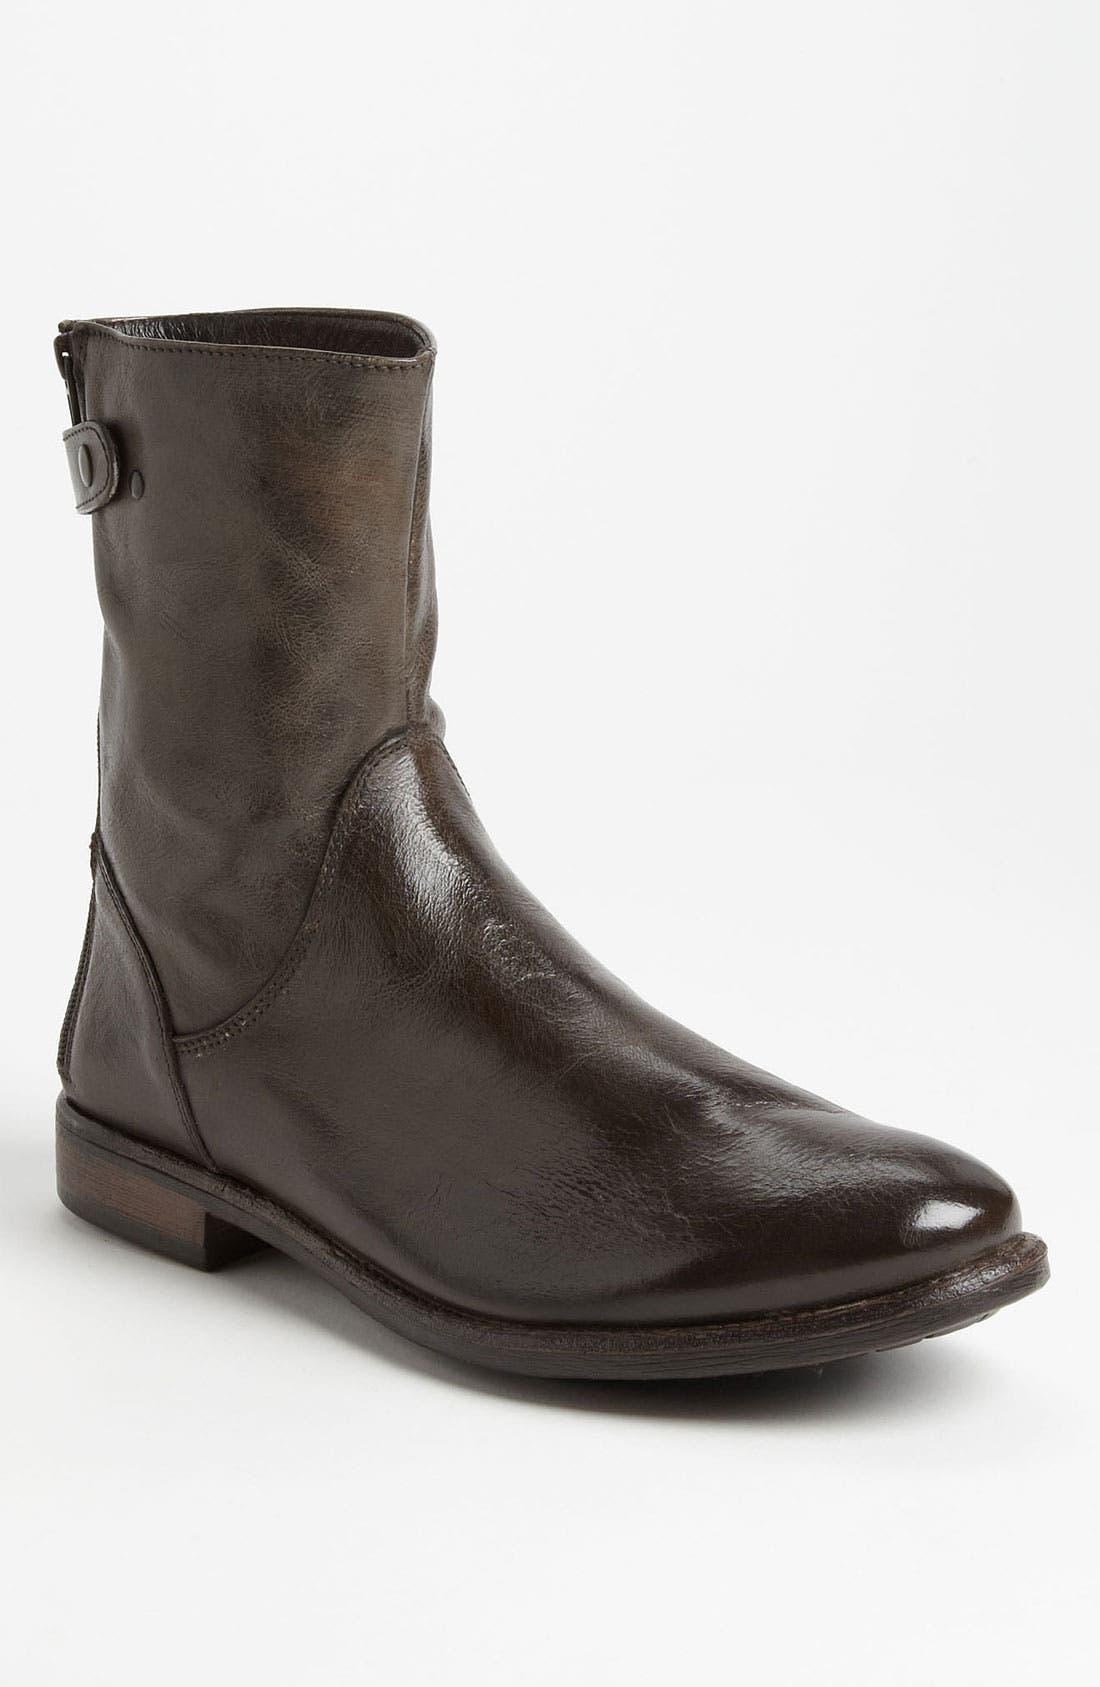 Alternate Image 1 Selected - Bacco Bucci 'Bareda' Boot (Men)